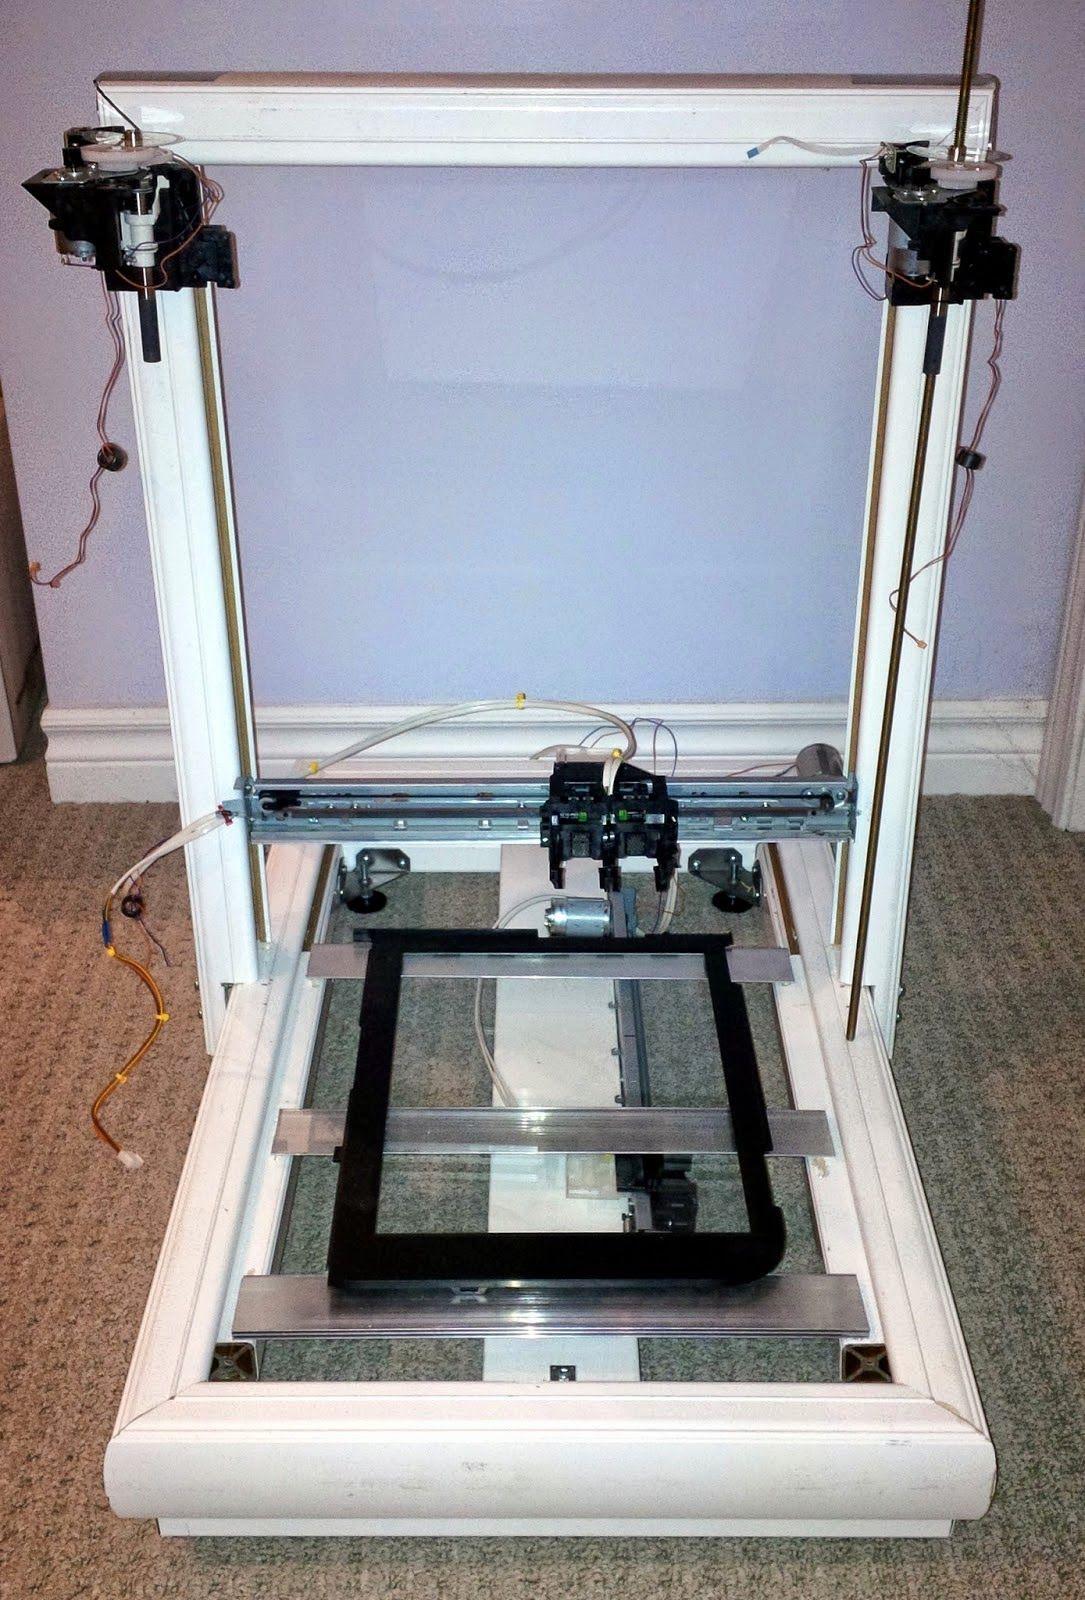 Diy 3d printing repscrap diy 3d printer from salvaged